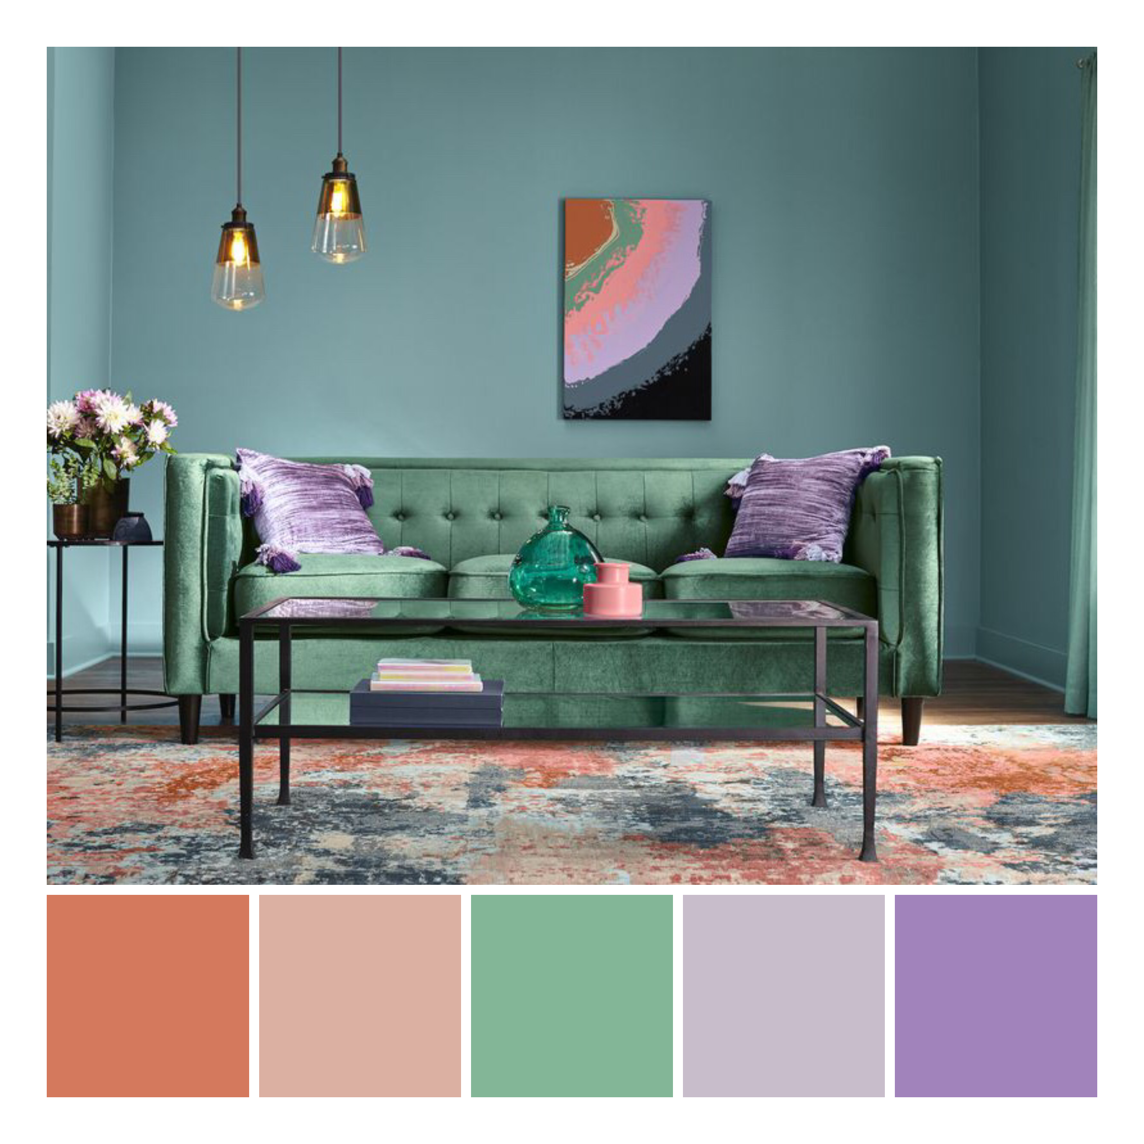 Green Sofa Living Room Colour Schemes Interior Design Greensofalivingroomco In 2021 Interior Design Color Schemes Living Room Color Schemes Room Color Schemes